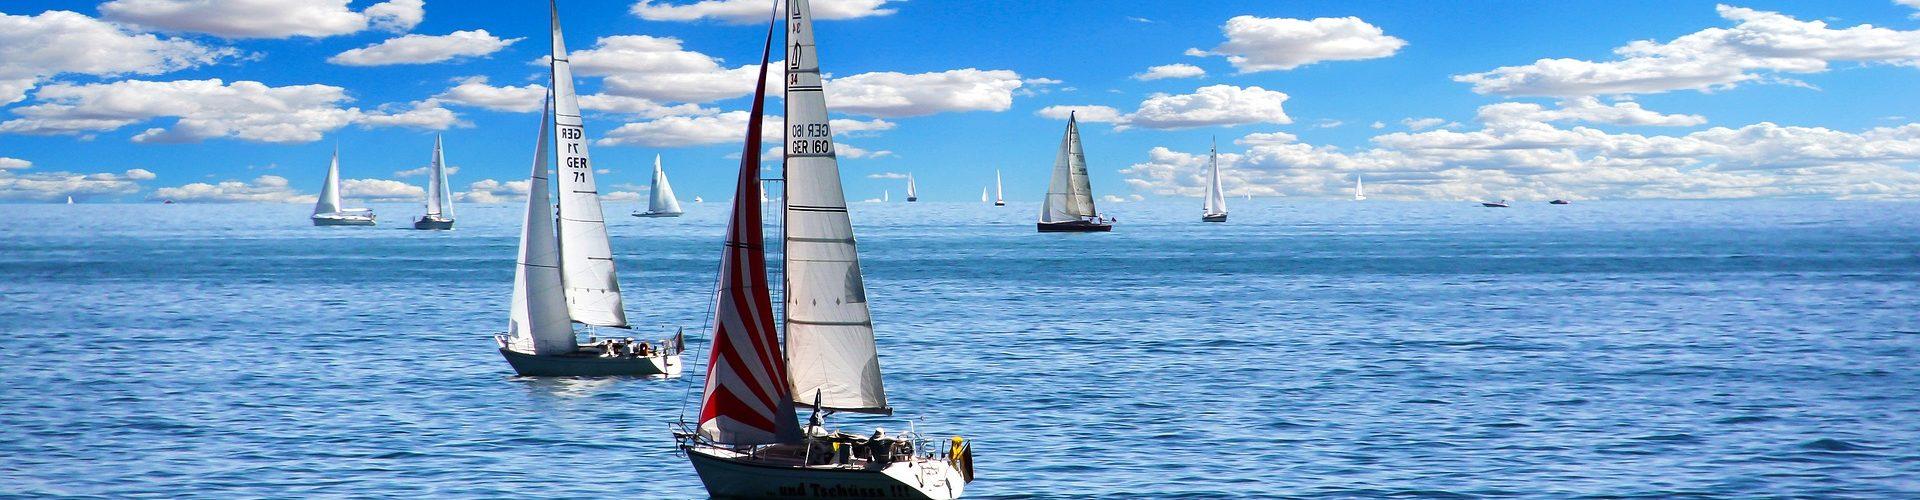 segeln lernen in Schloß Holte Stukenbrock segelschein machen in Schloß Holte Stukenbrock 1920x500 - Segeln lernen in Schloß Holte-Stukenbrock